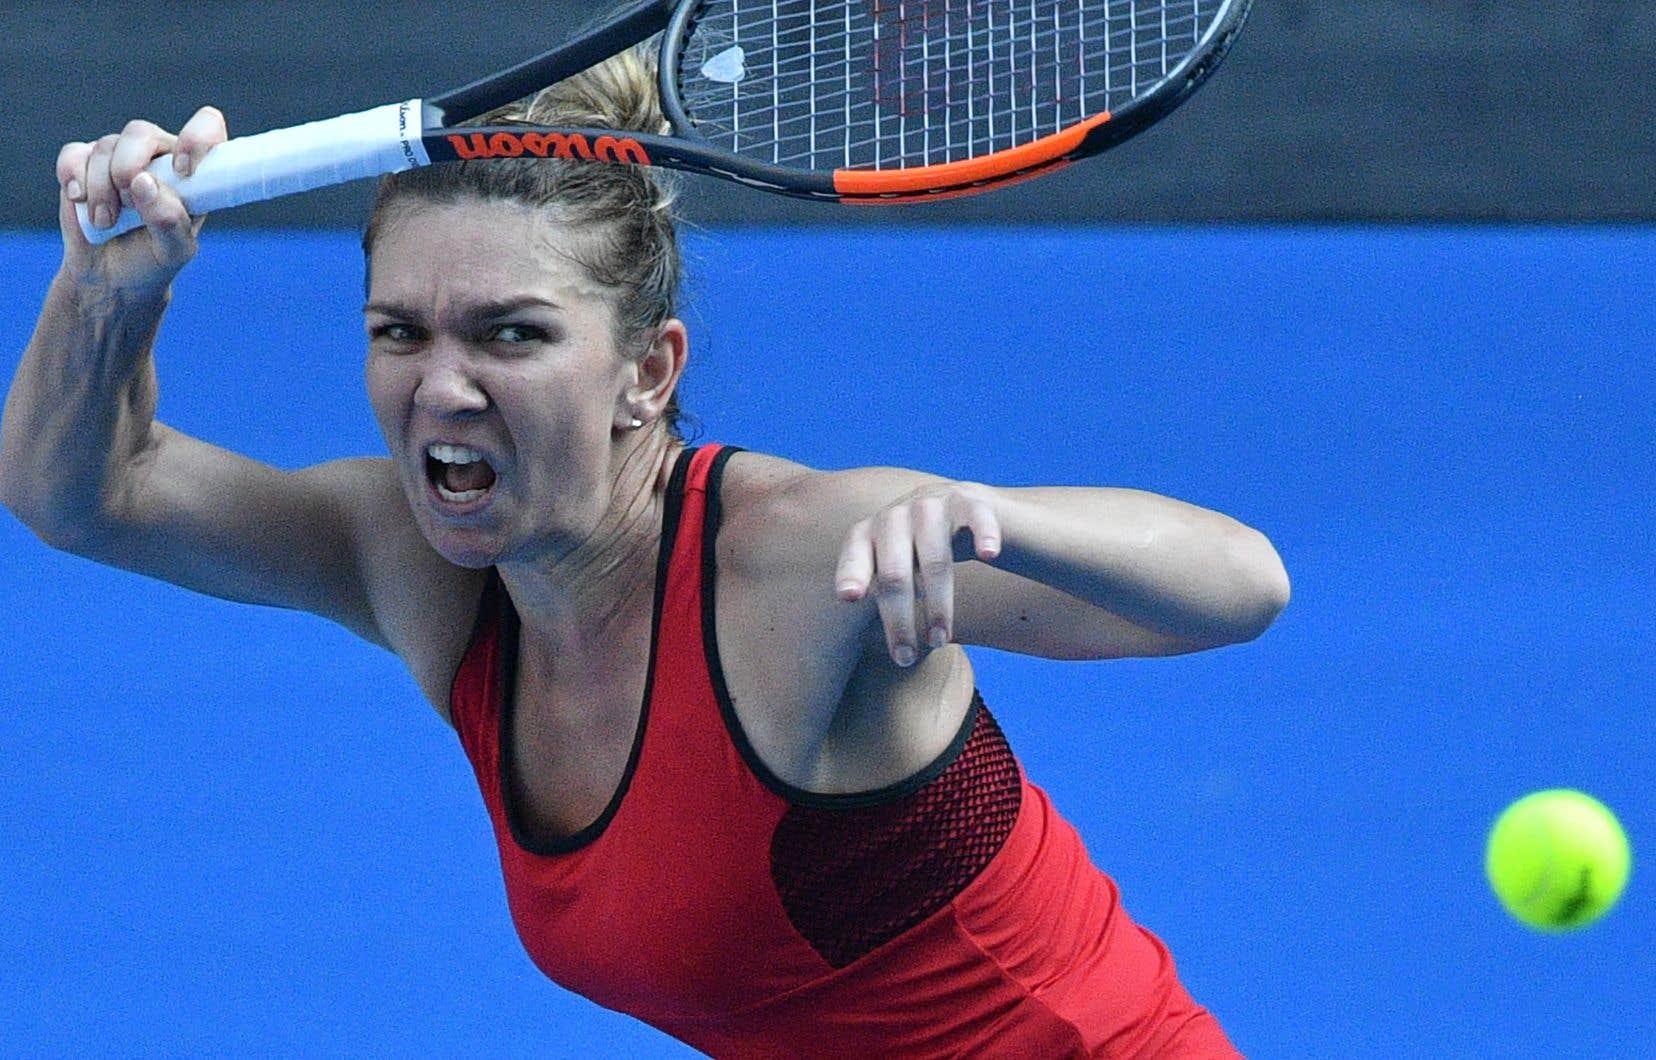 La joueuse Simona Halep lors de son match de demi-finale à Melbourne, jeudi